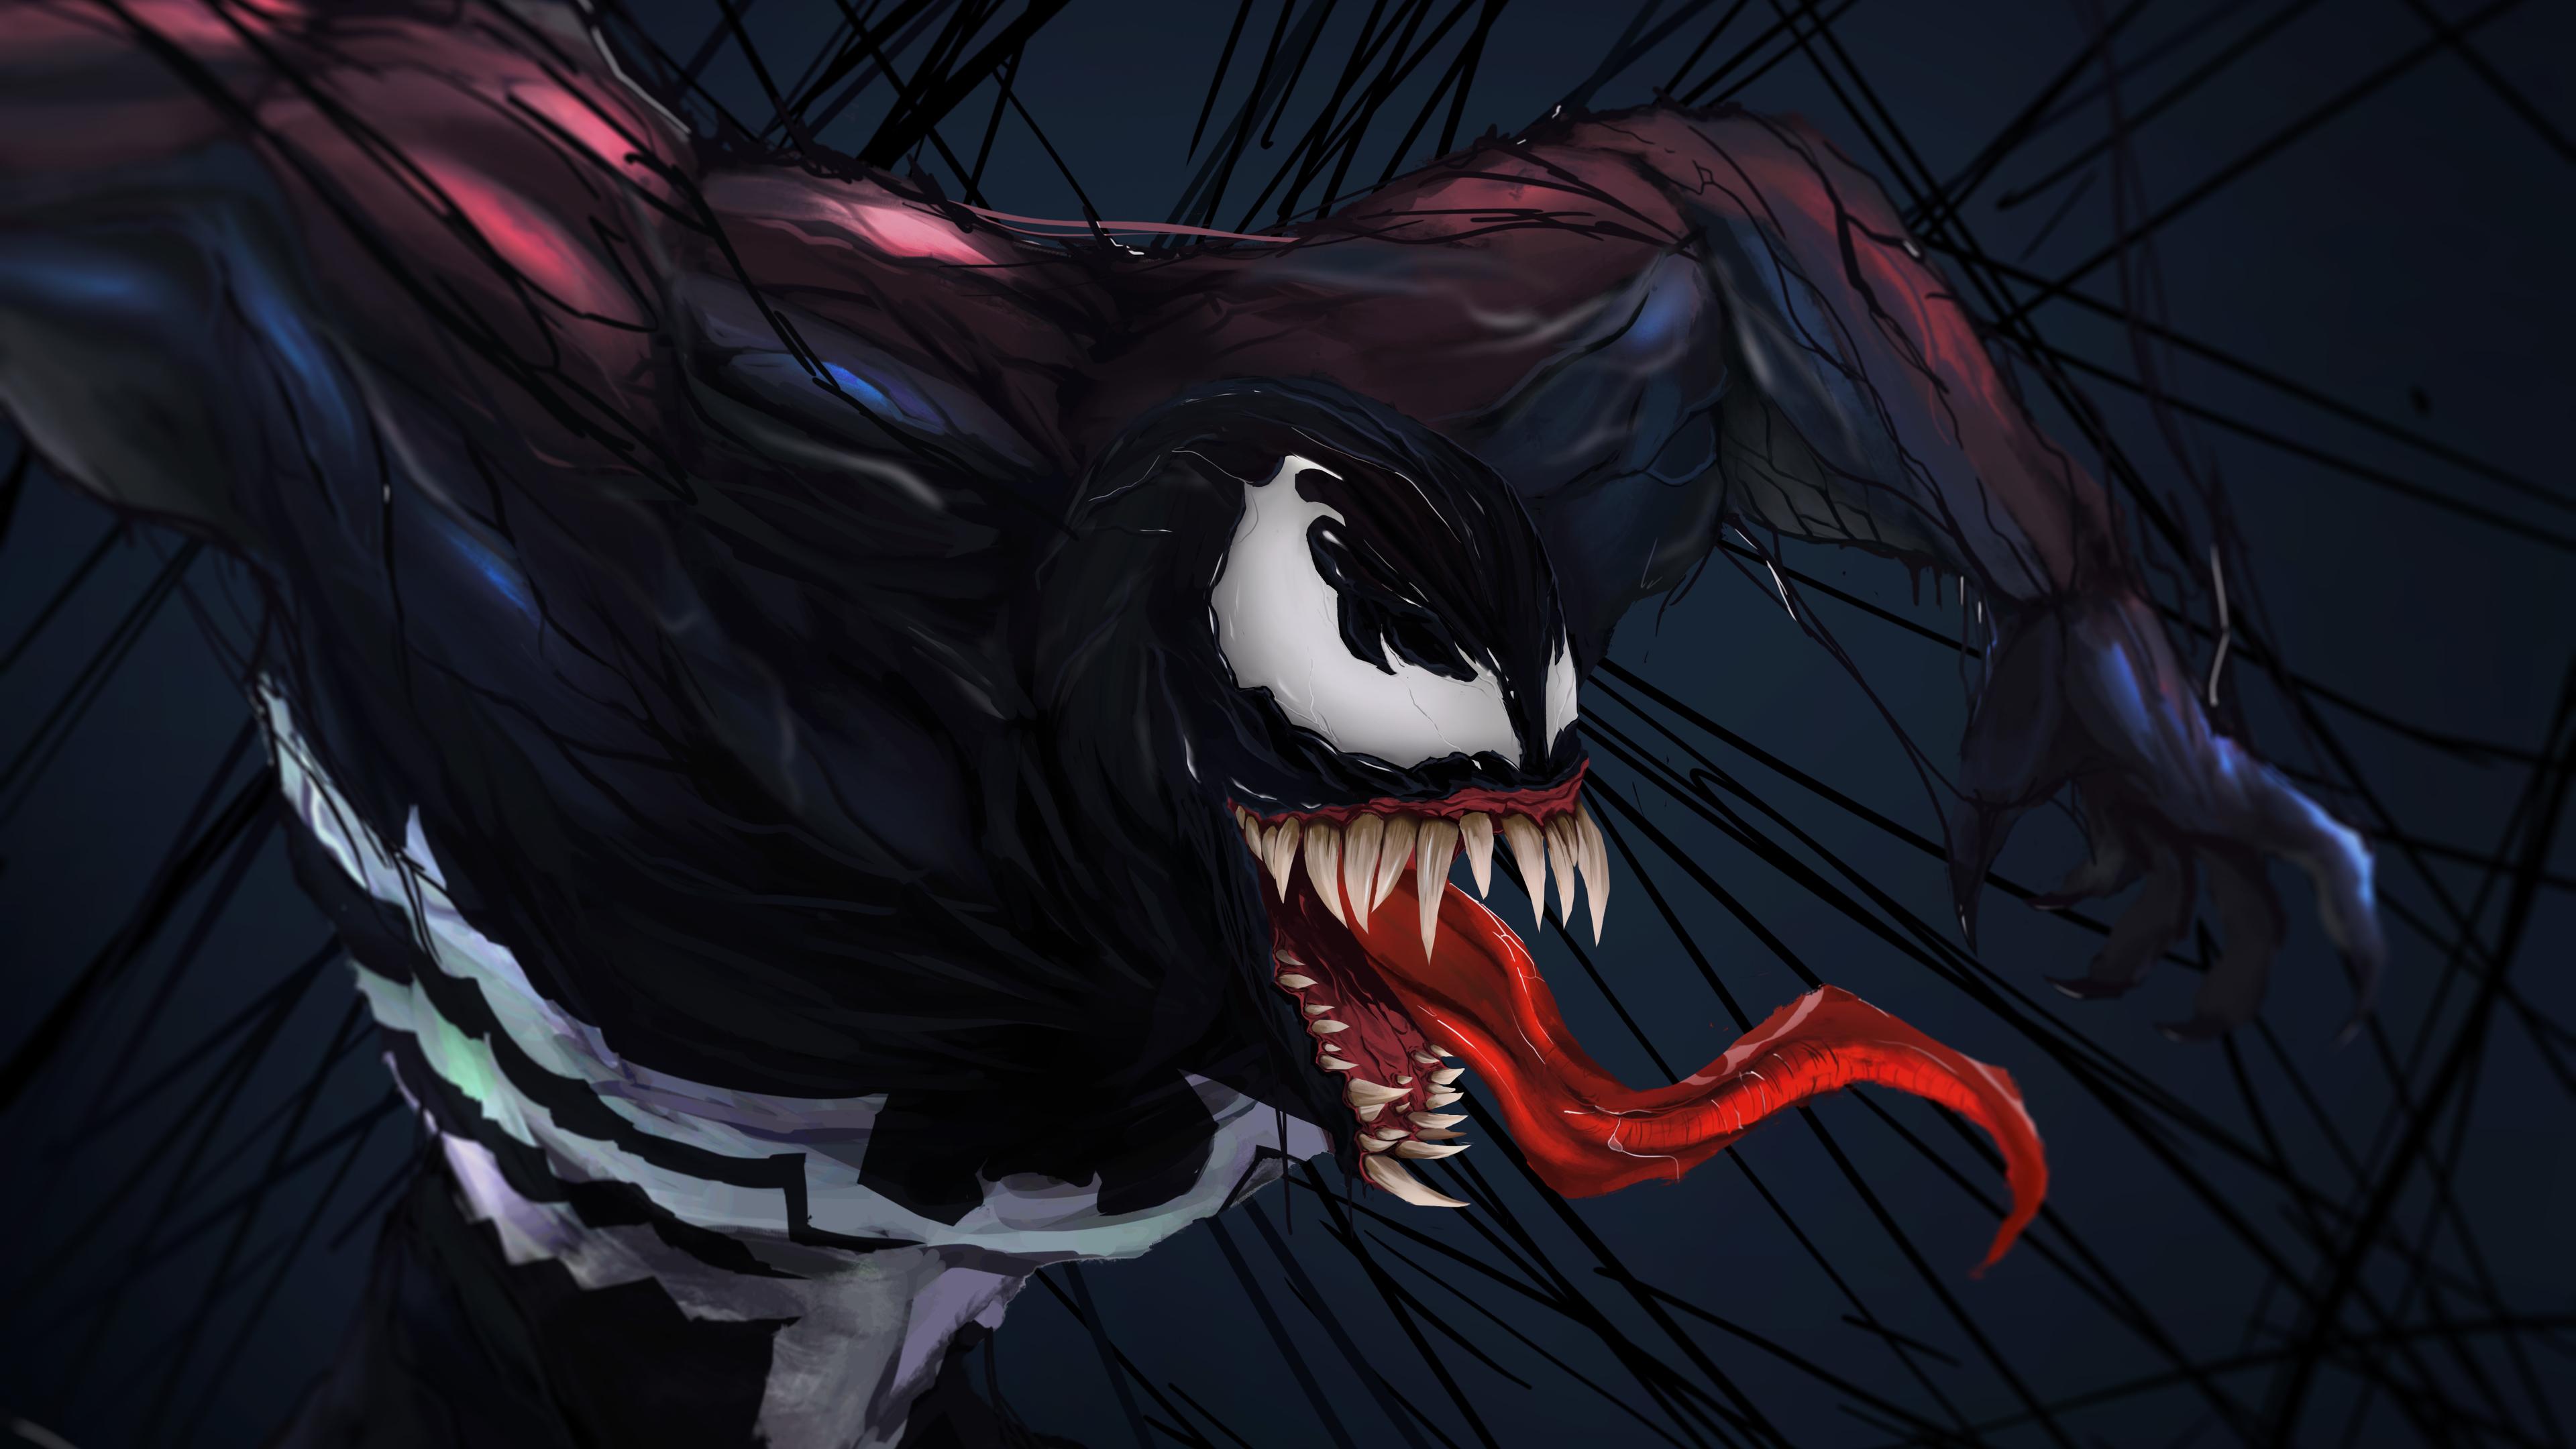 2048x2048 Venom 2018 Movie 4k Ipad Air Hd 4k Wallpapers: Venom Digital Art 5k Venom Wallpapers, Superheroes